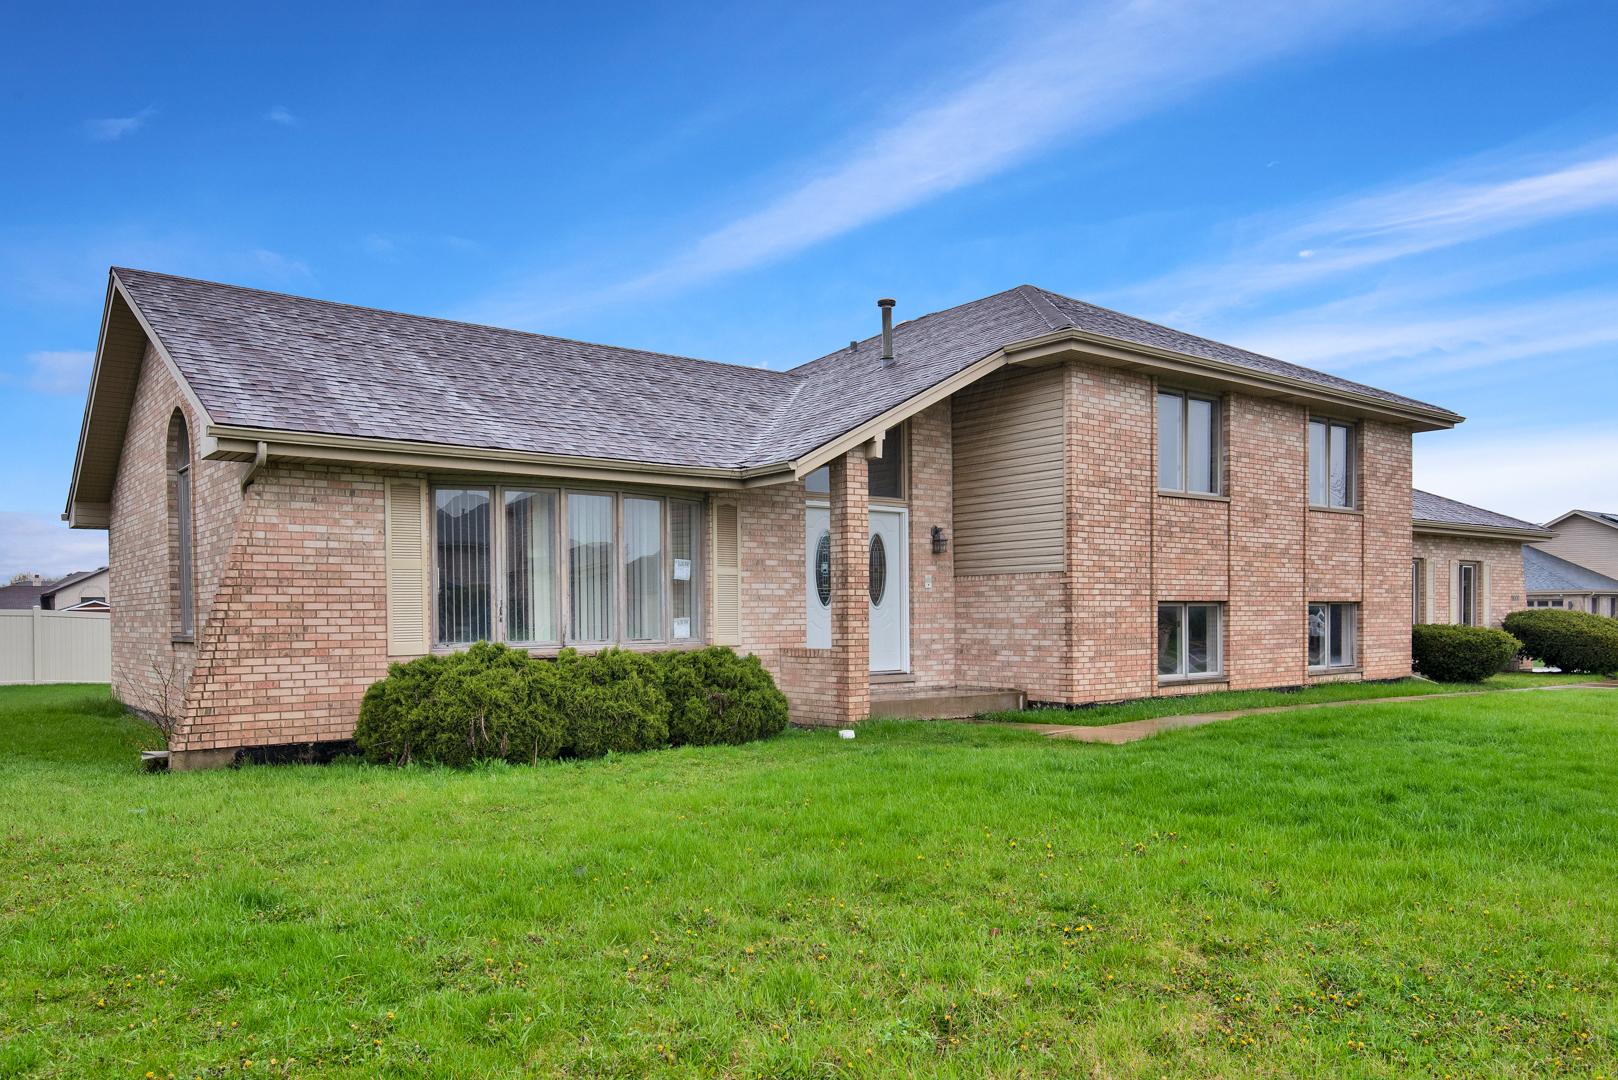 19000 Marylake, COUNTRY CLUB HILLS, Illinois, 60478